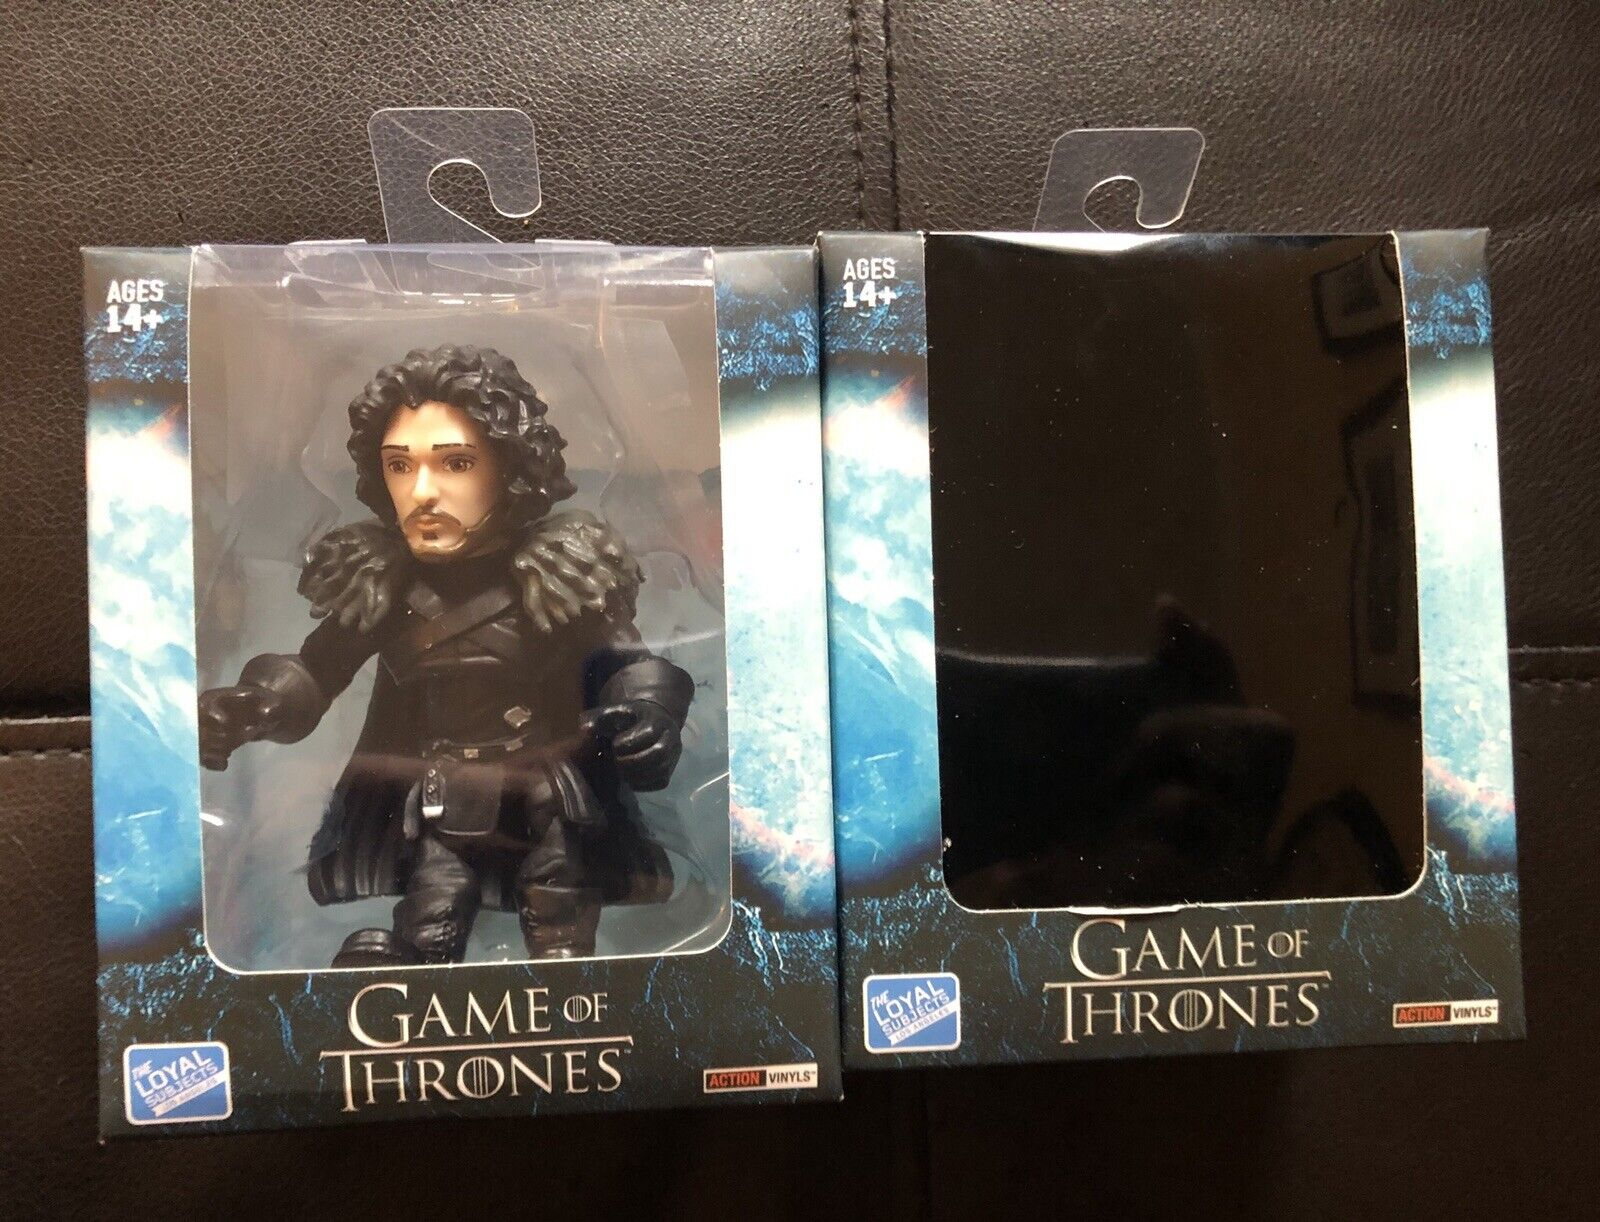 2 Loyal Subjects Game Of Thrones Figures Jon Snow & Daenerys Targaryen Blind Box